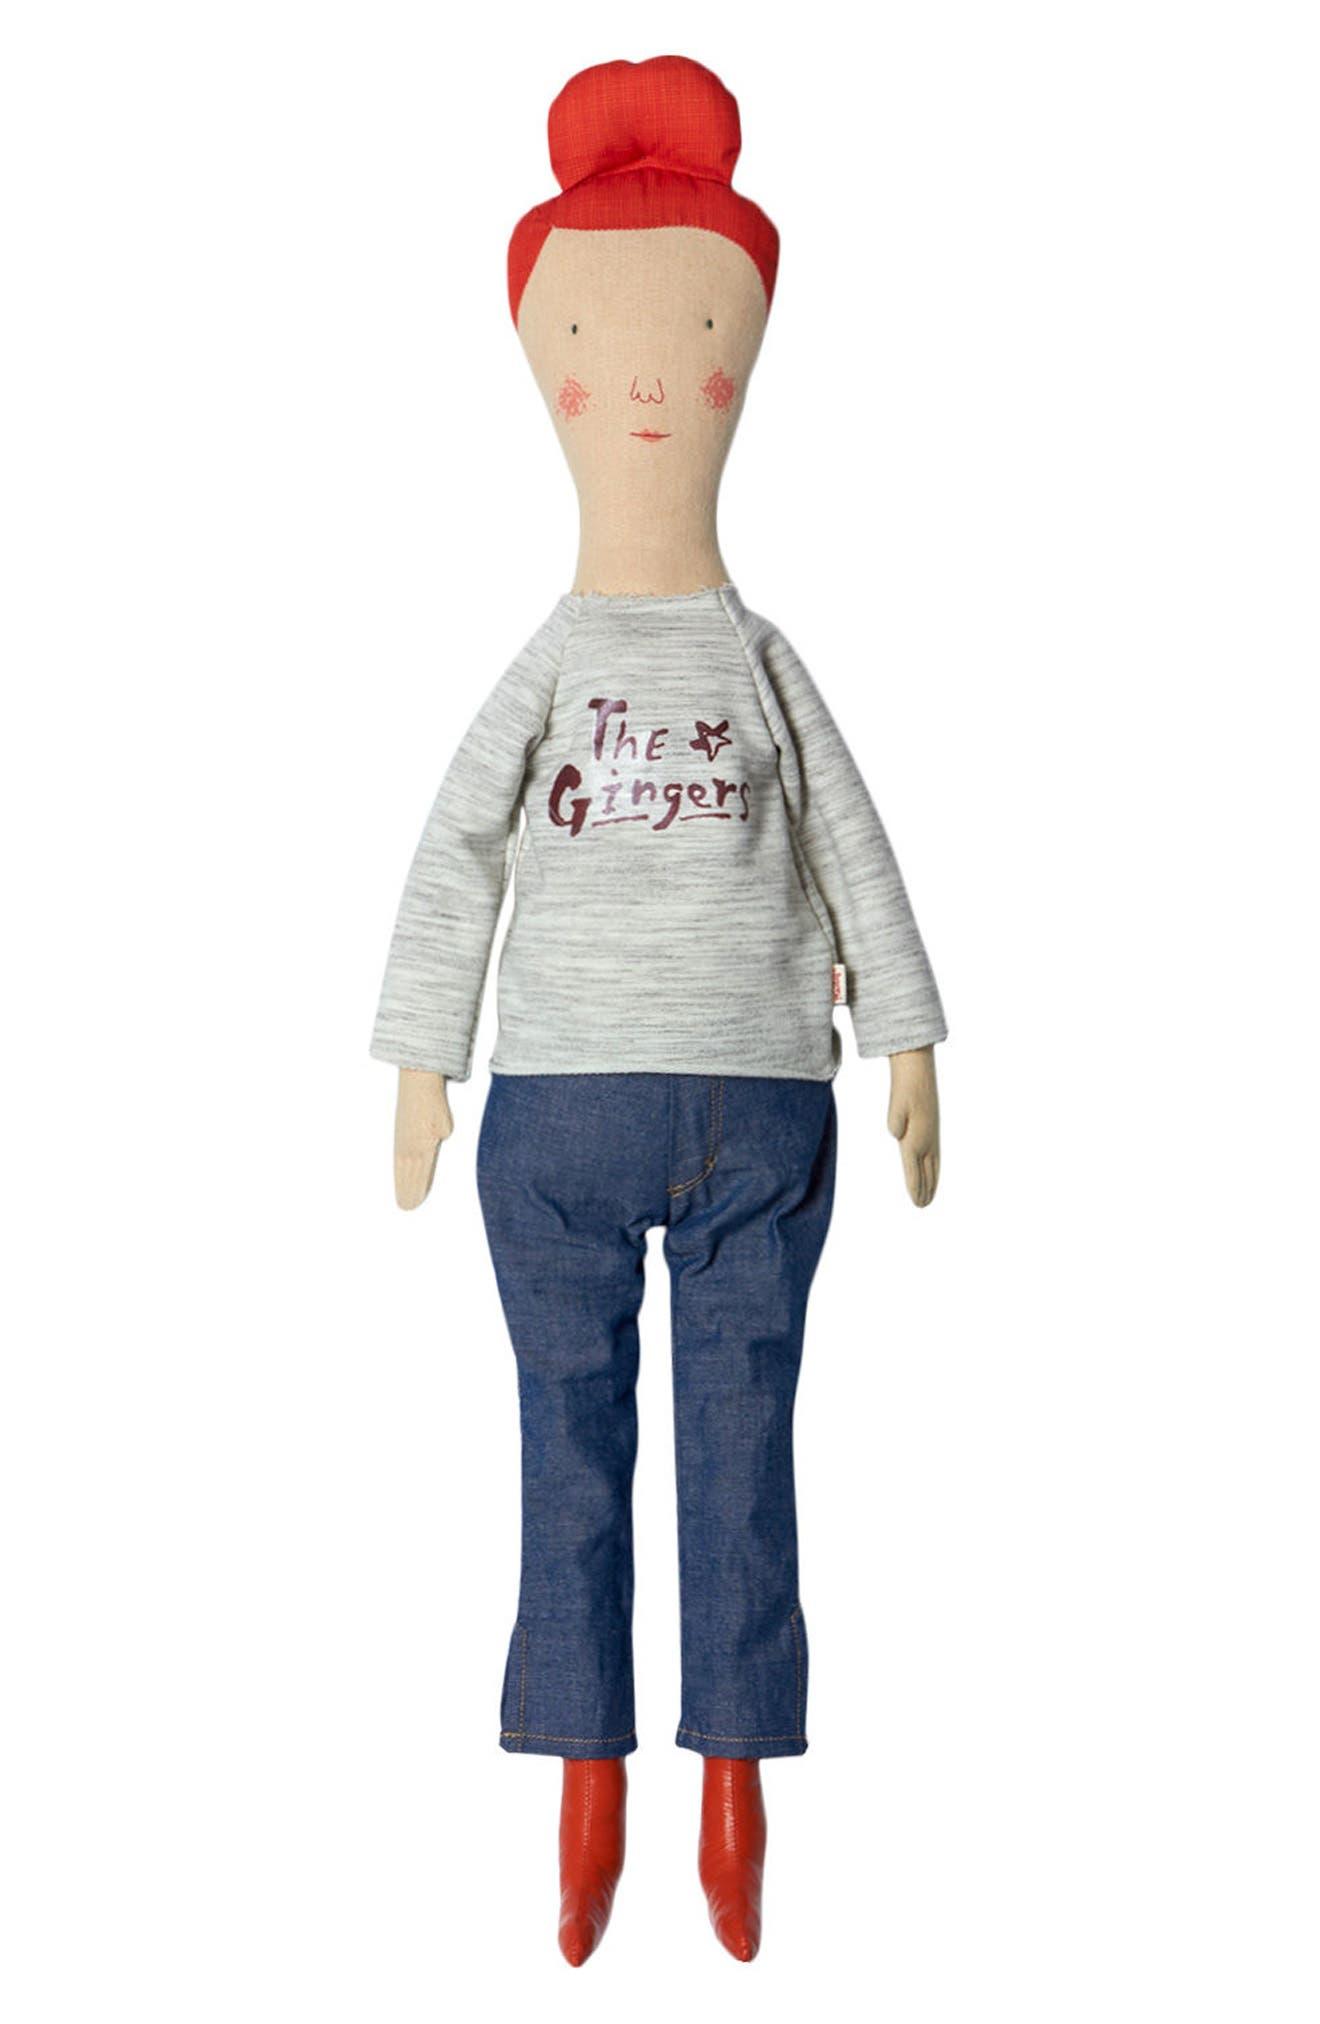 Main Image - Maileg Size 2 Ginger Mum Doll